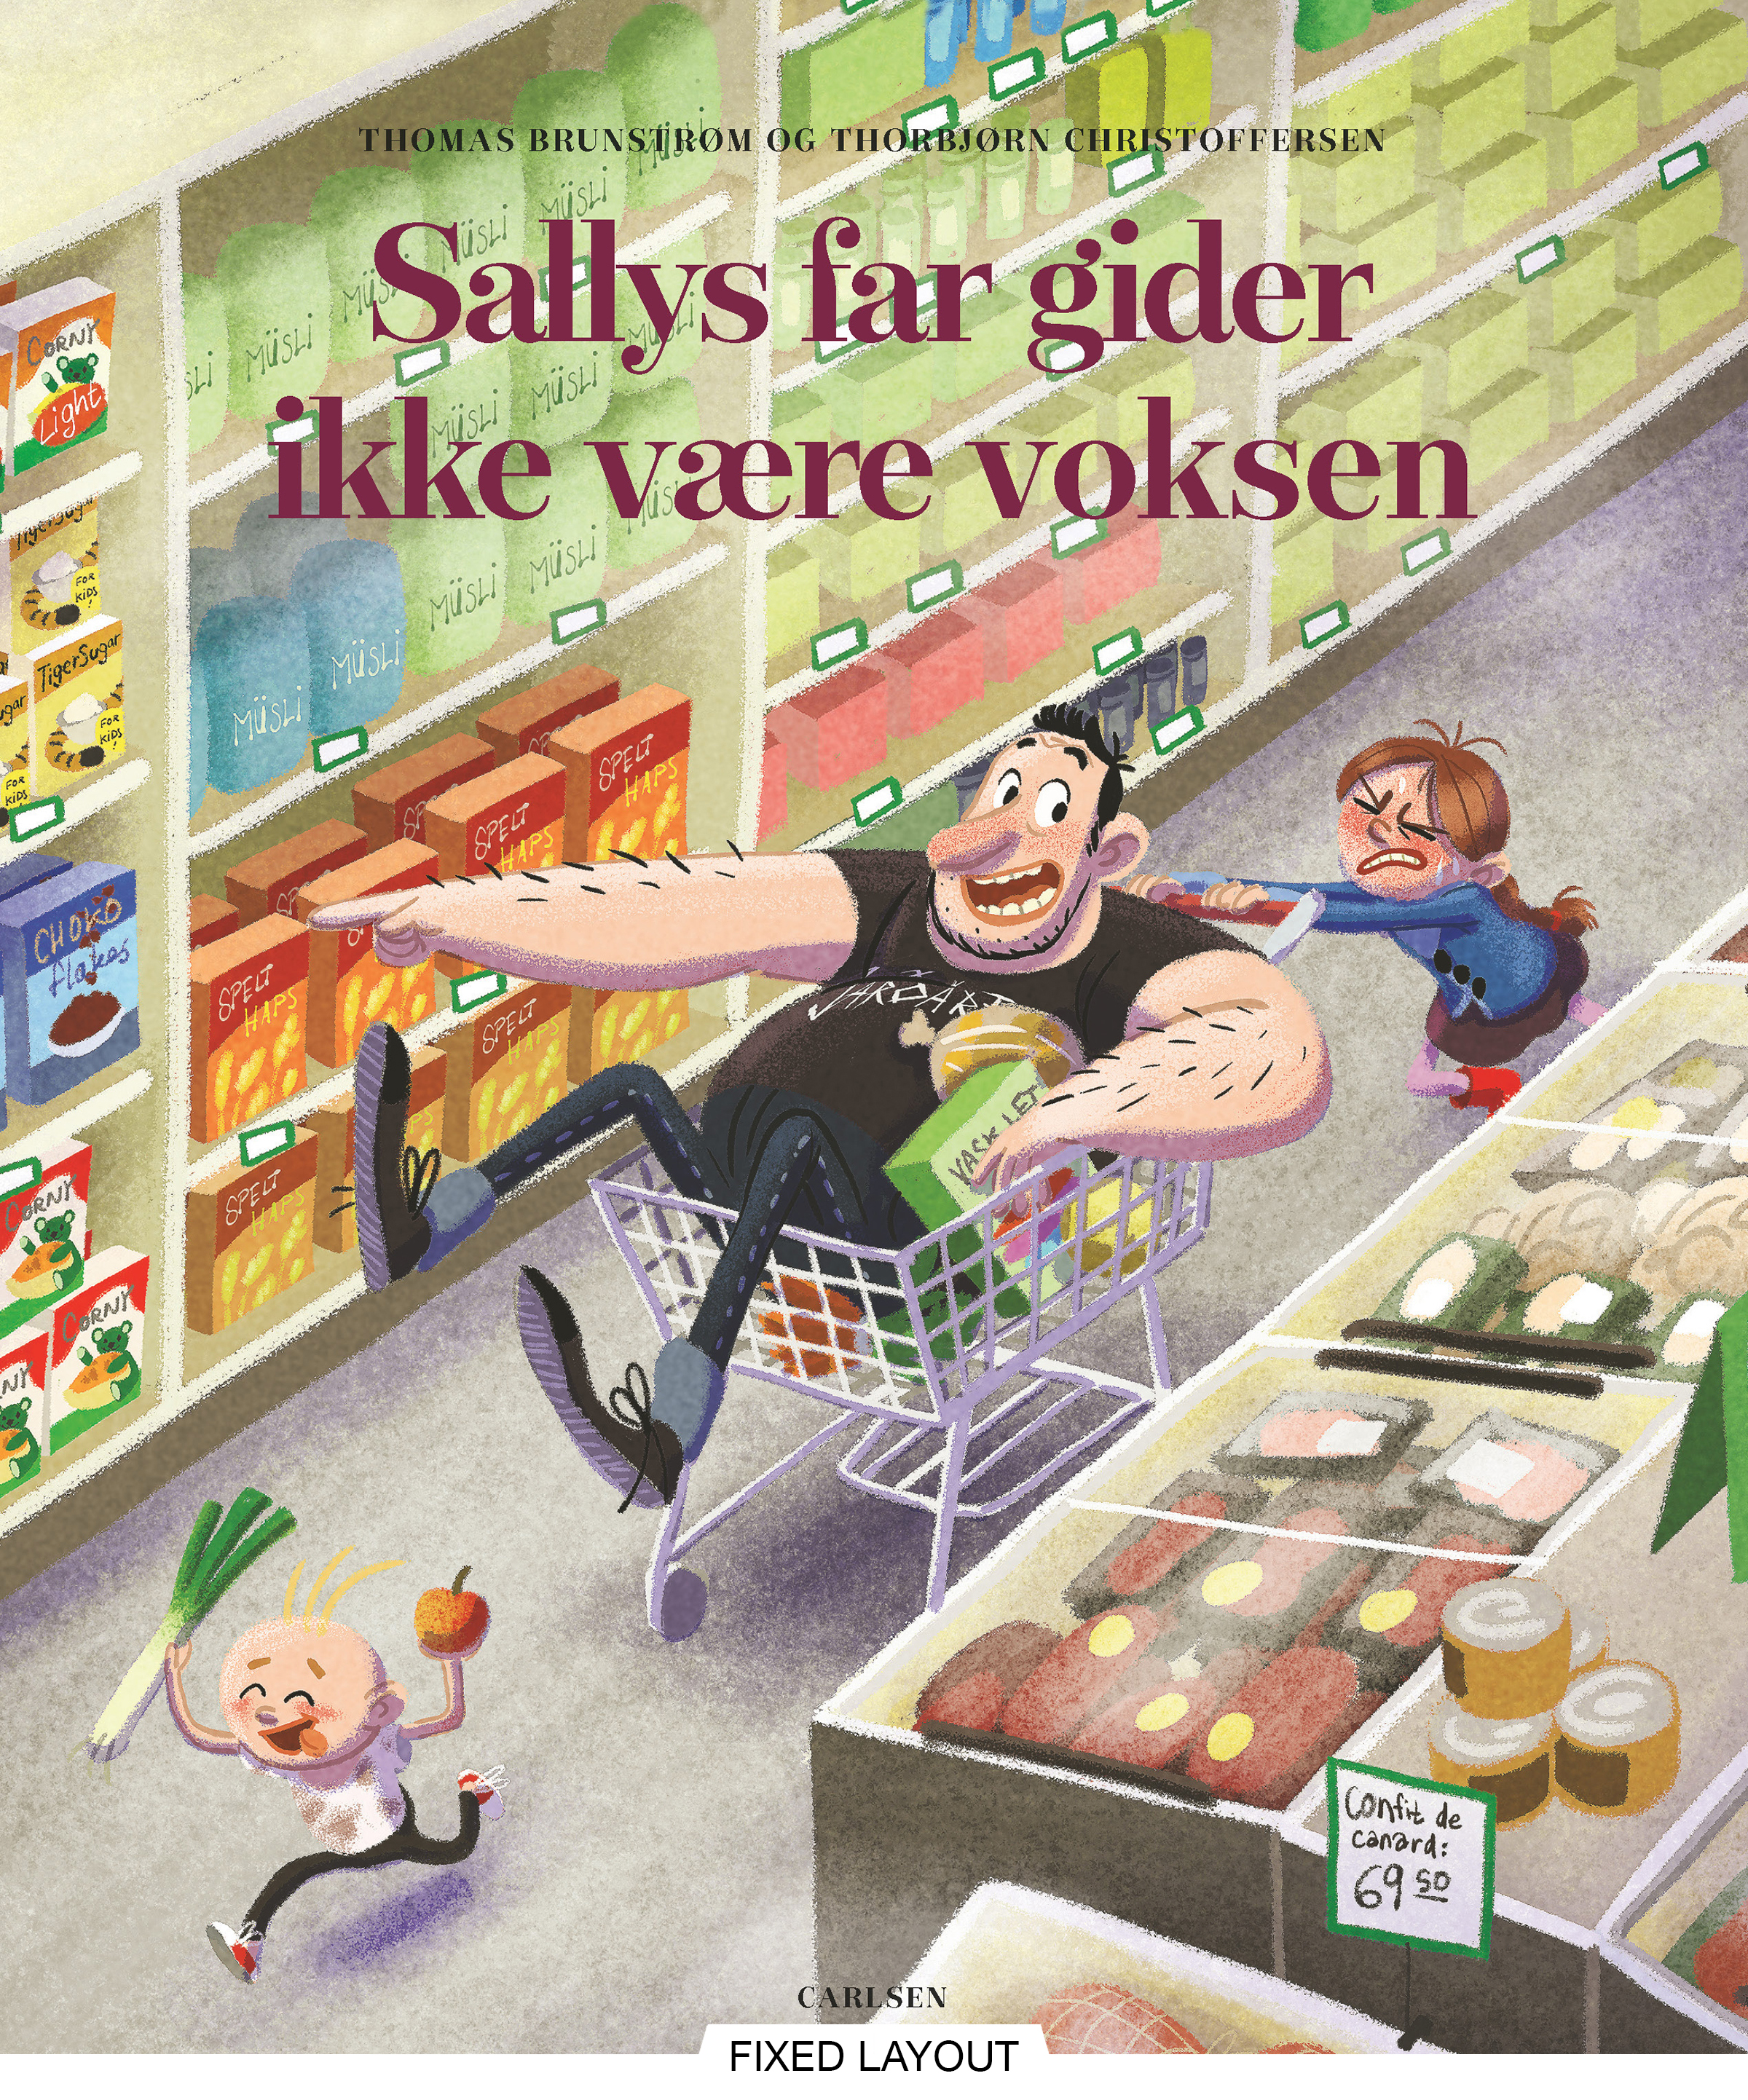 Sallys far gider ikke at være voksen - Maneno - 12173